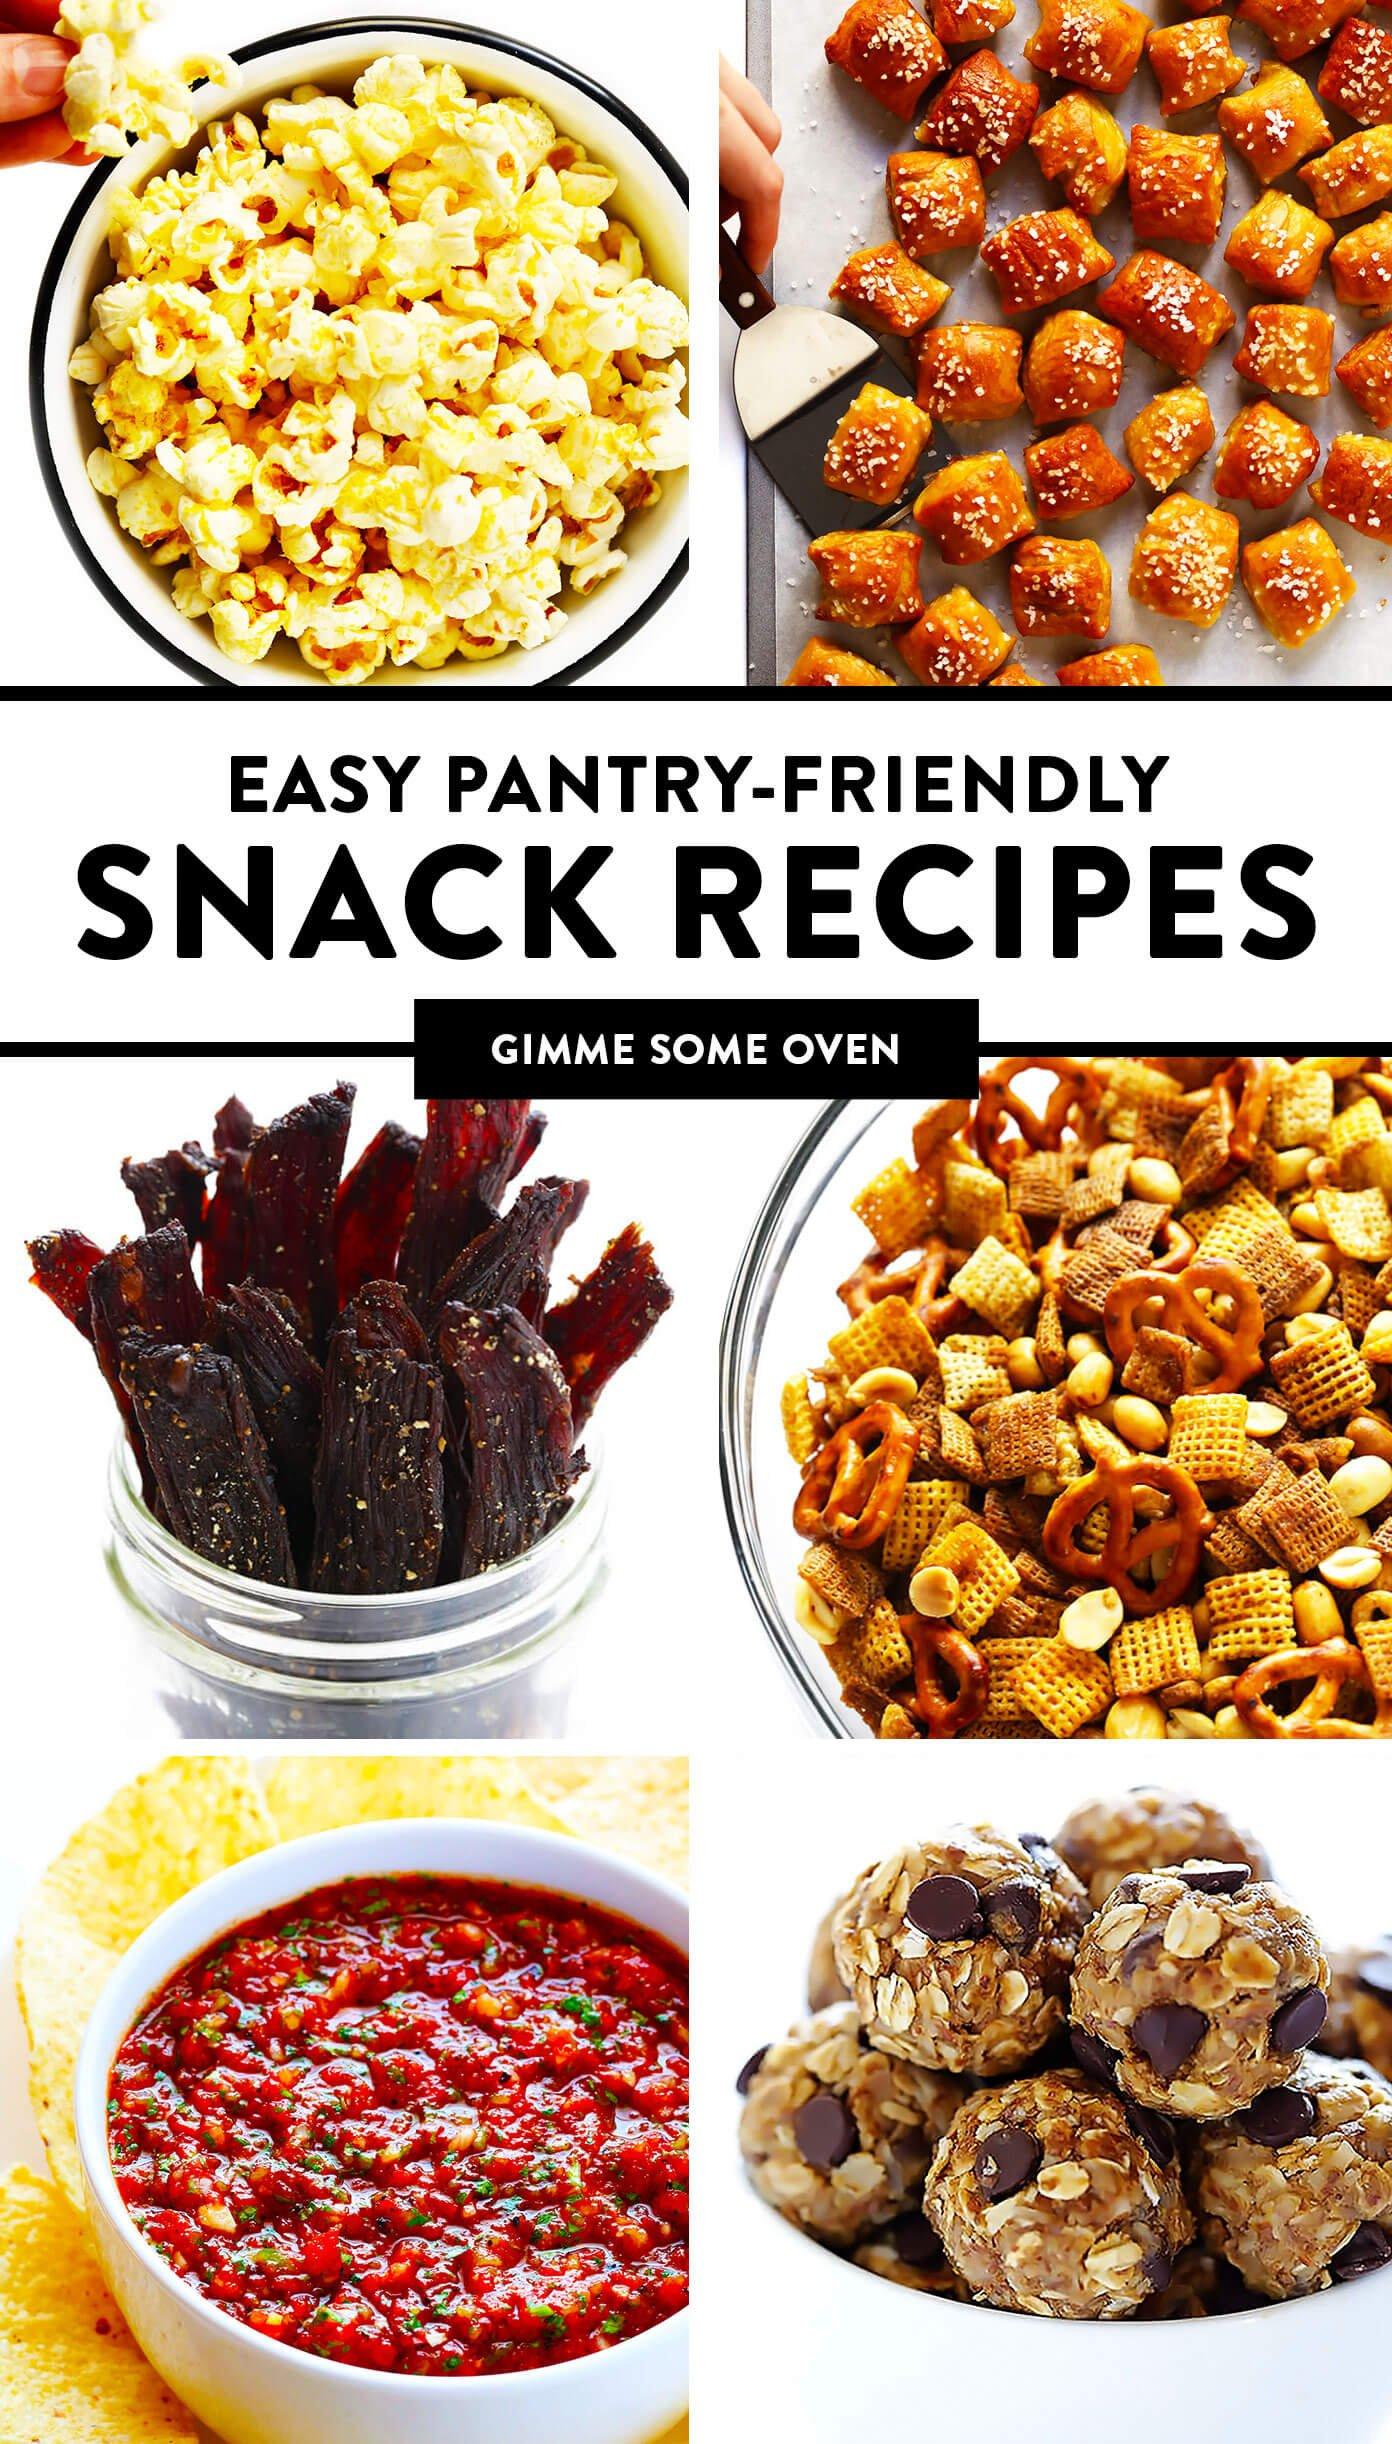 Pantry-Friendly Snack Recipes